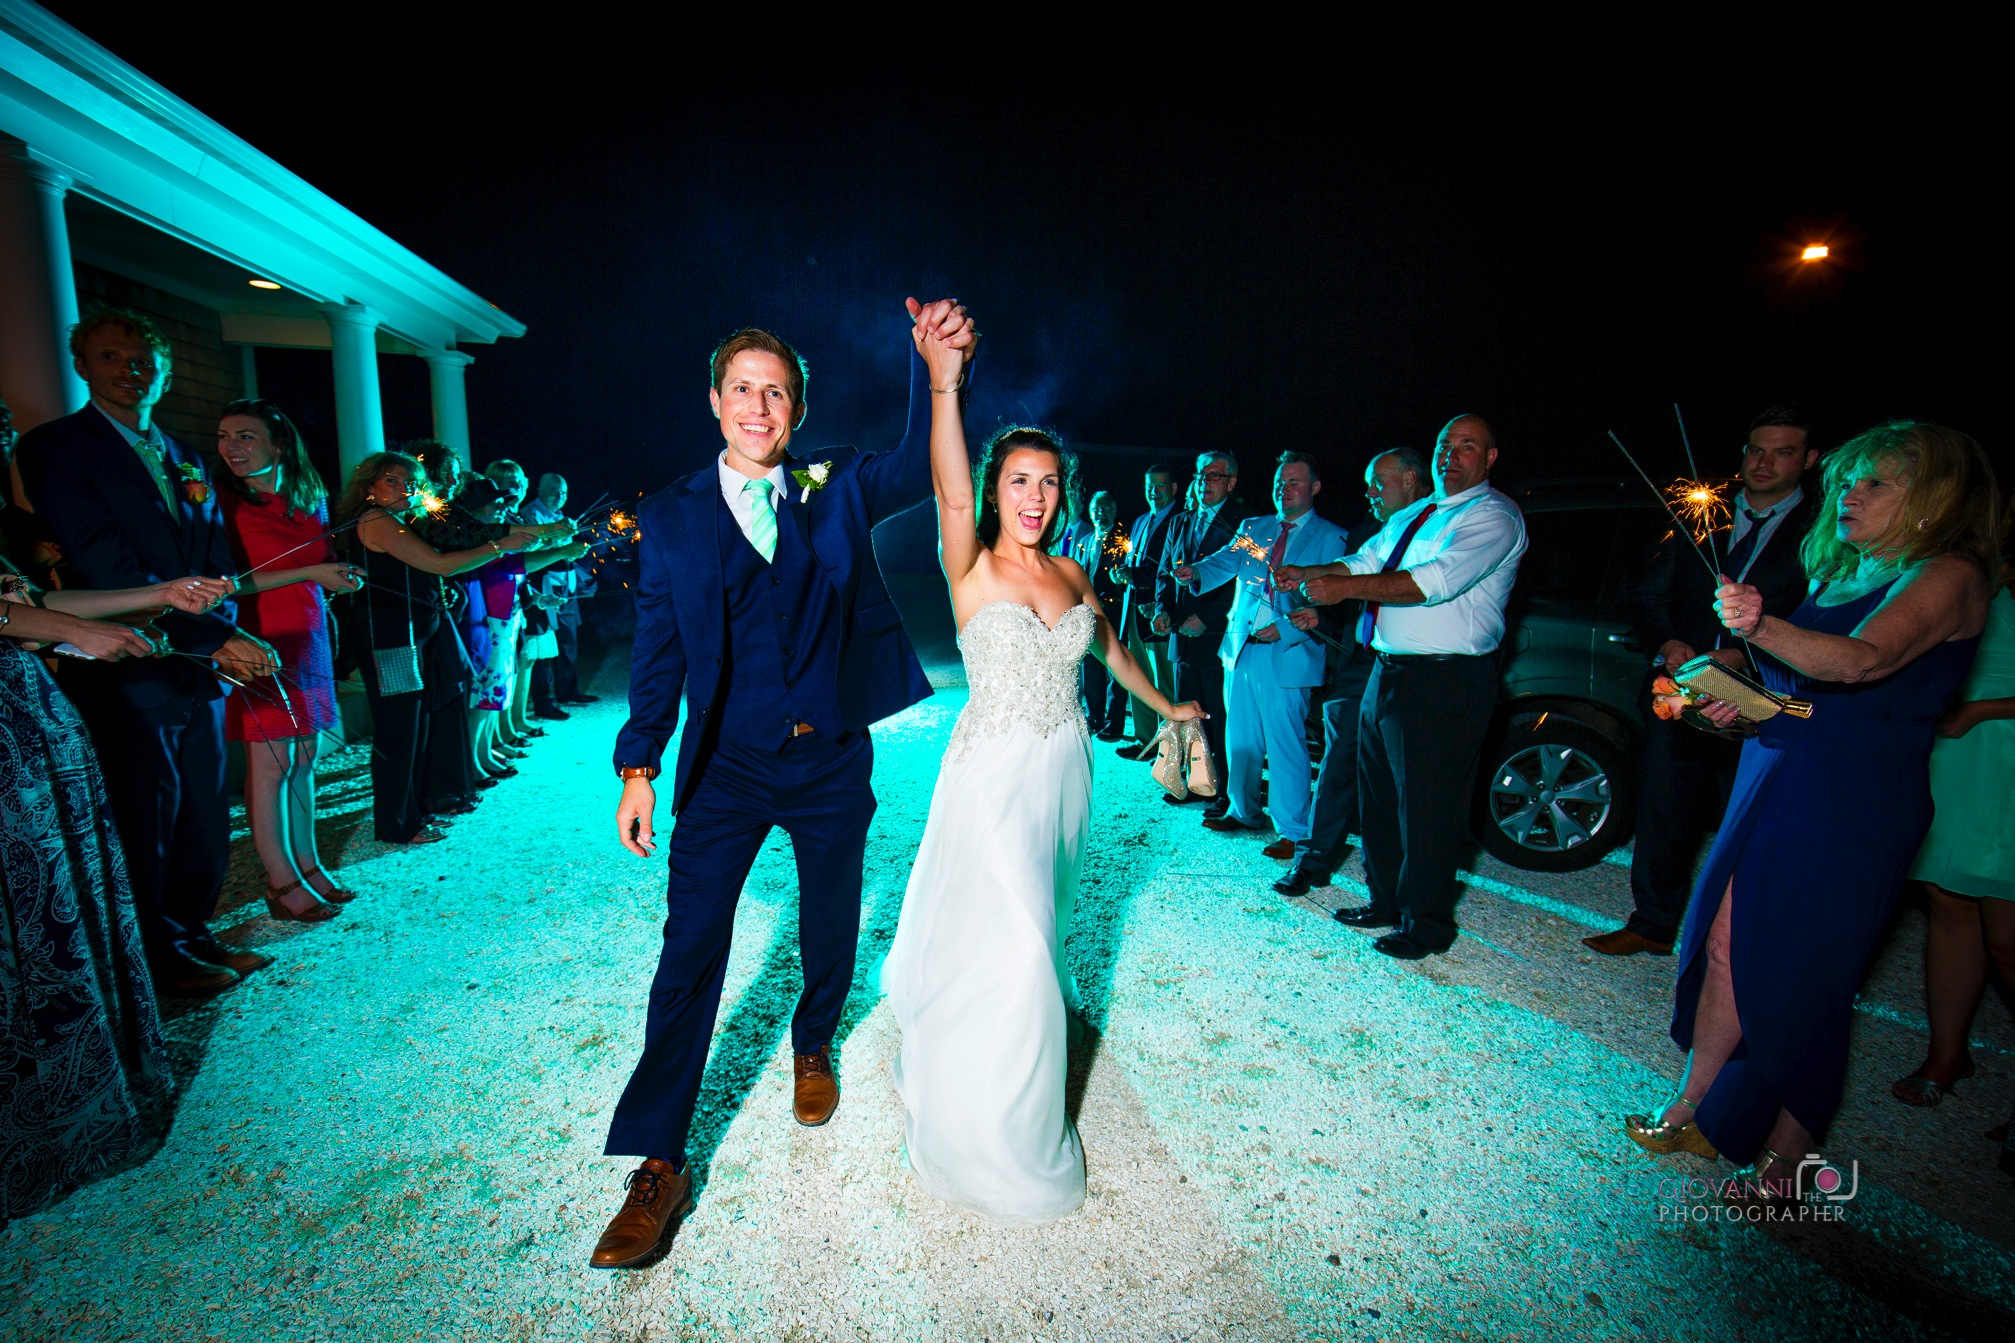 8C2A1280 Giovanni The Photographer-Boston Wedding Photography  Falmouth Yacht Club - Cape Cod - Meaghan and Tim WM 35.jpg